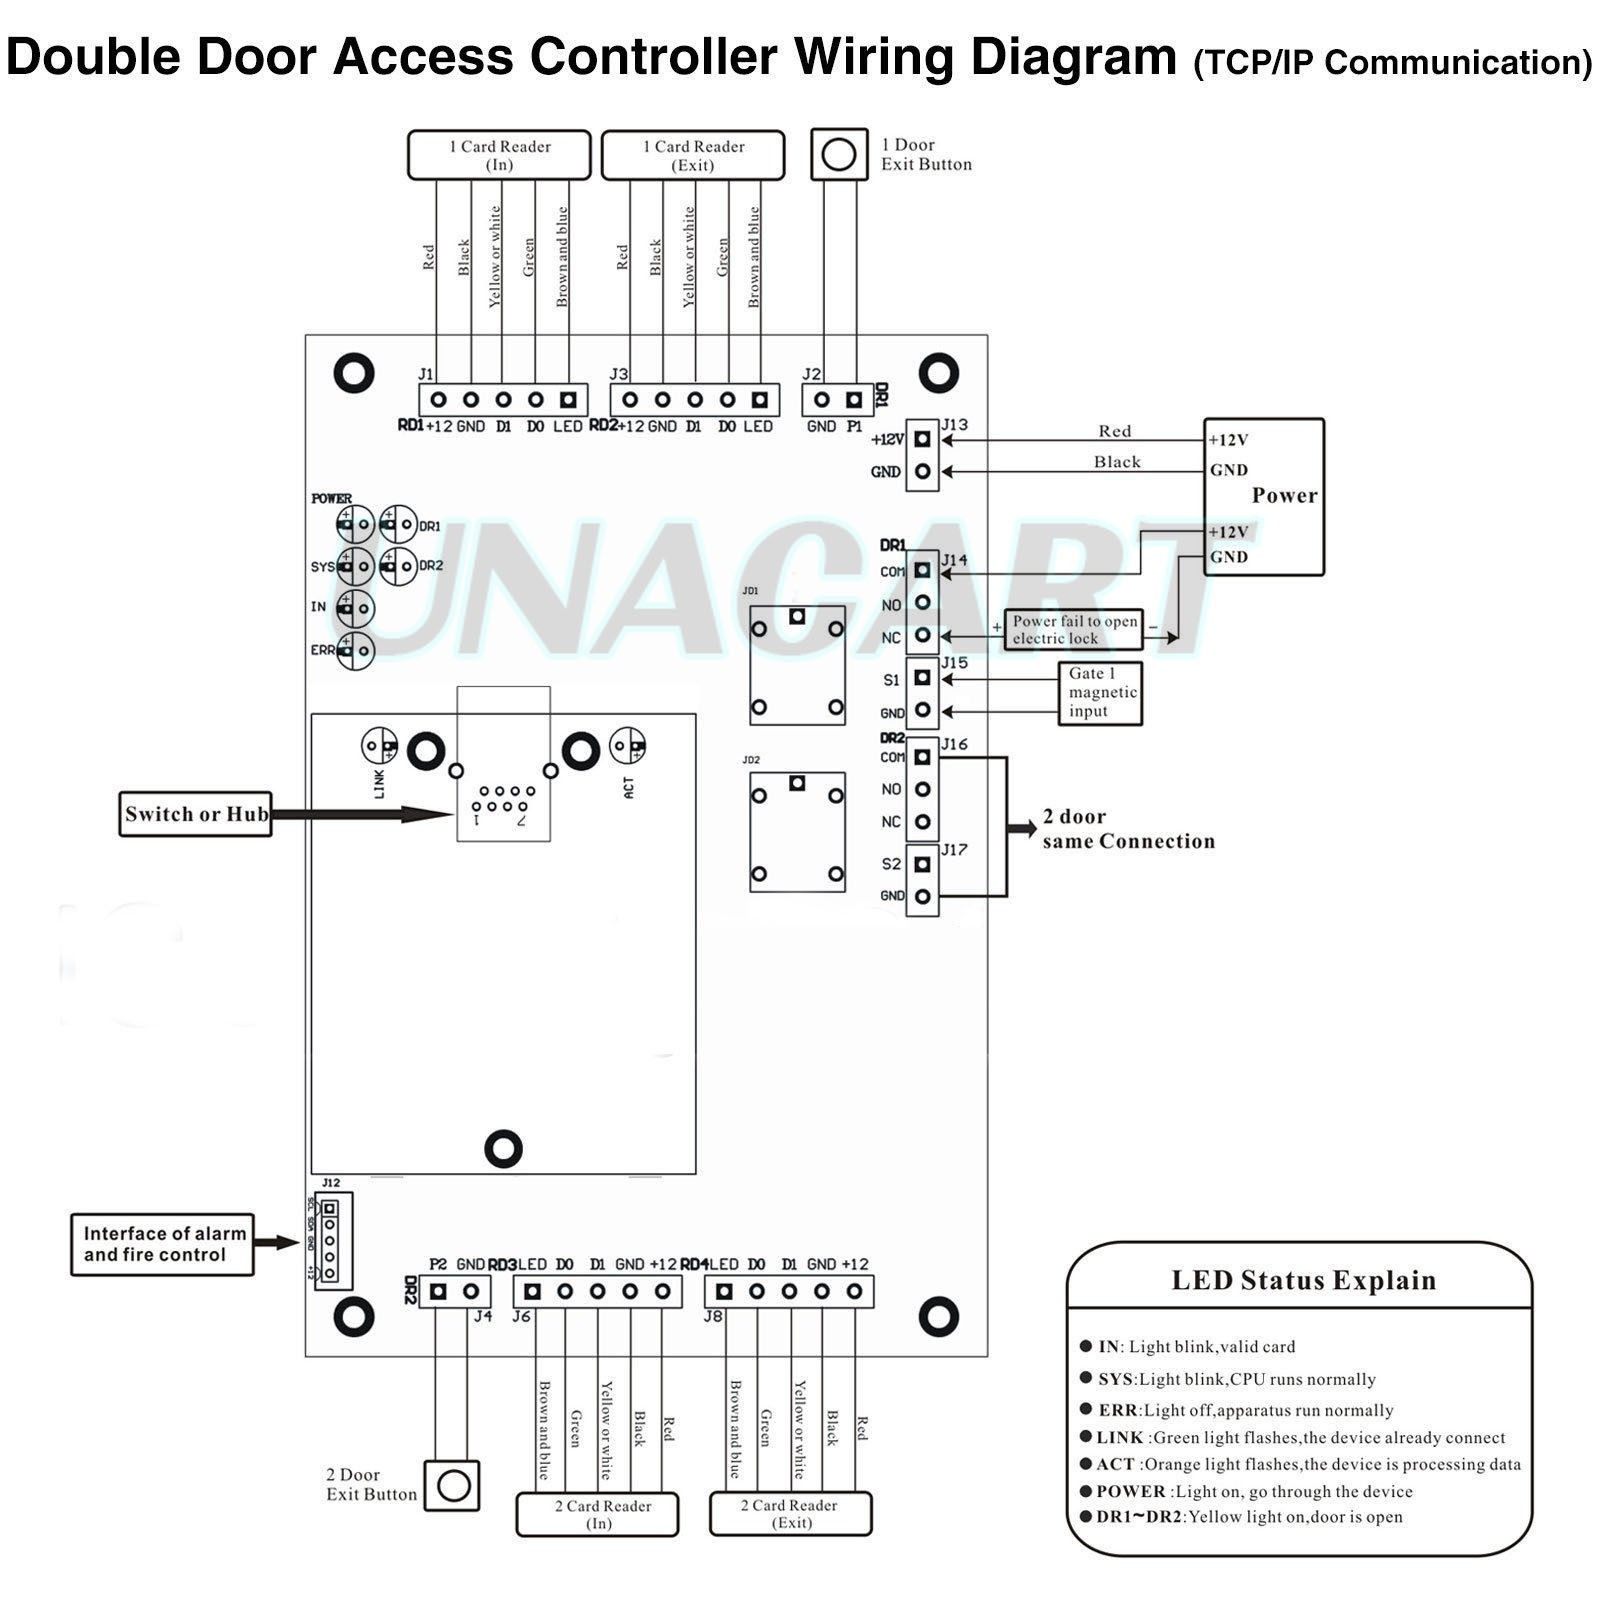 hid miniprox reader wiring diagram 1987 mazda b2000 radio prox my